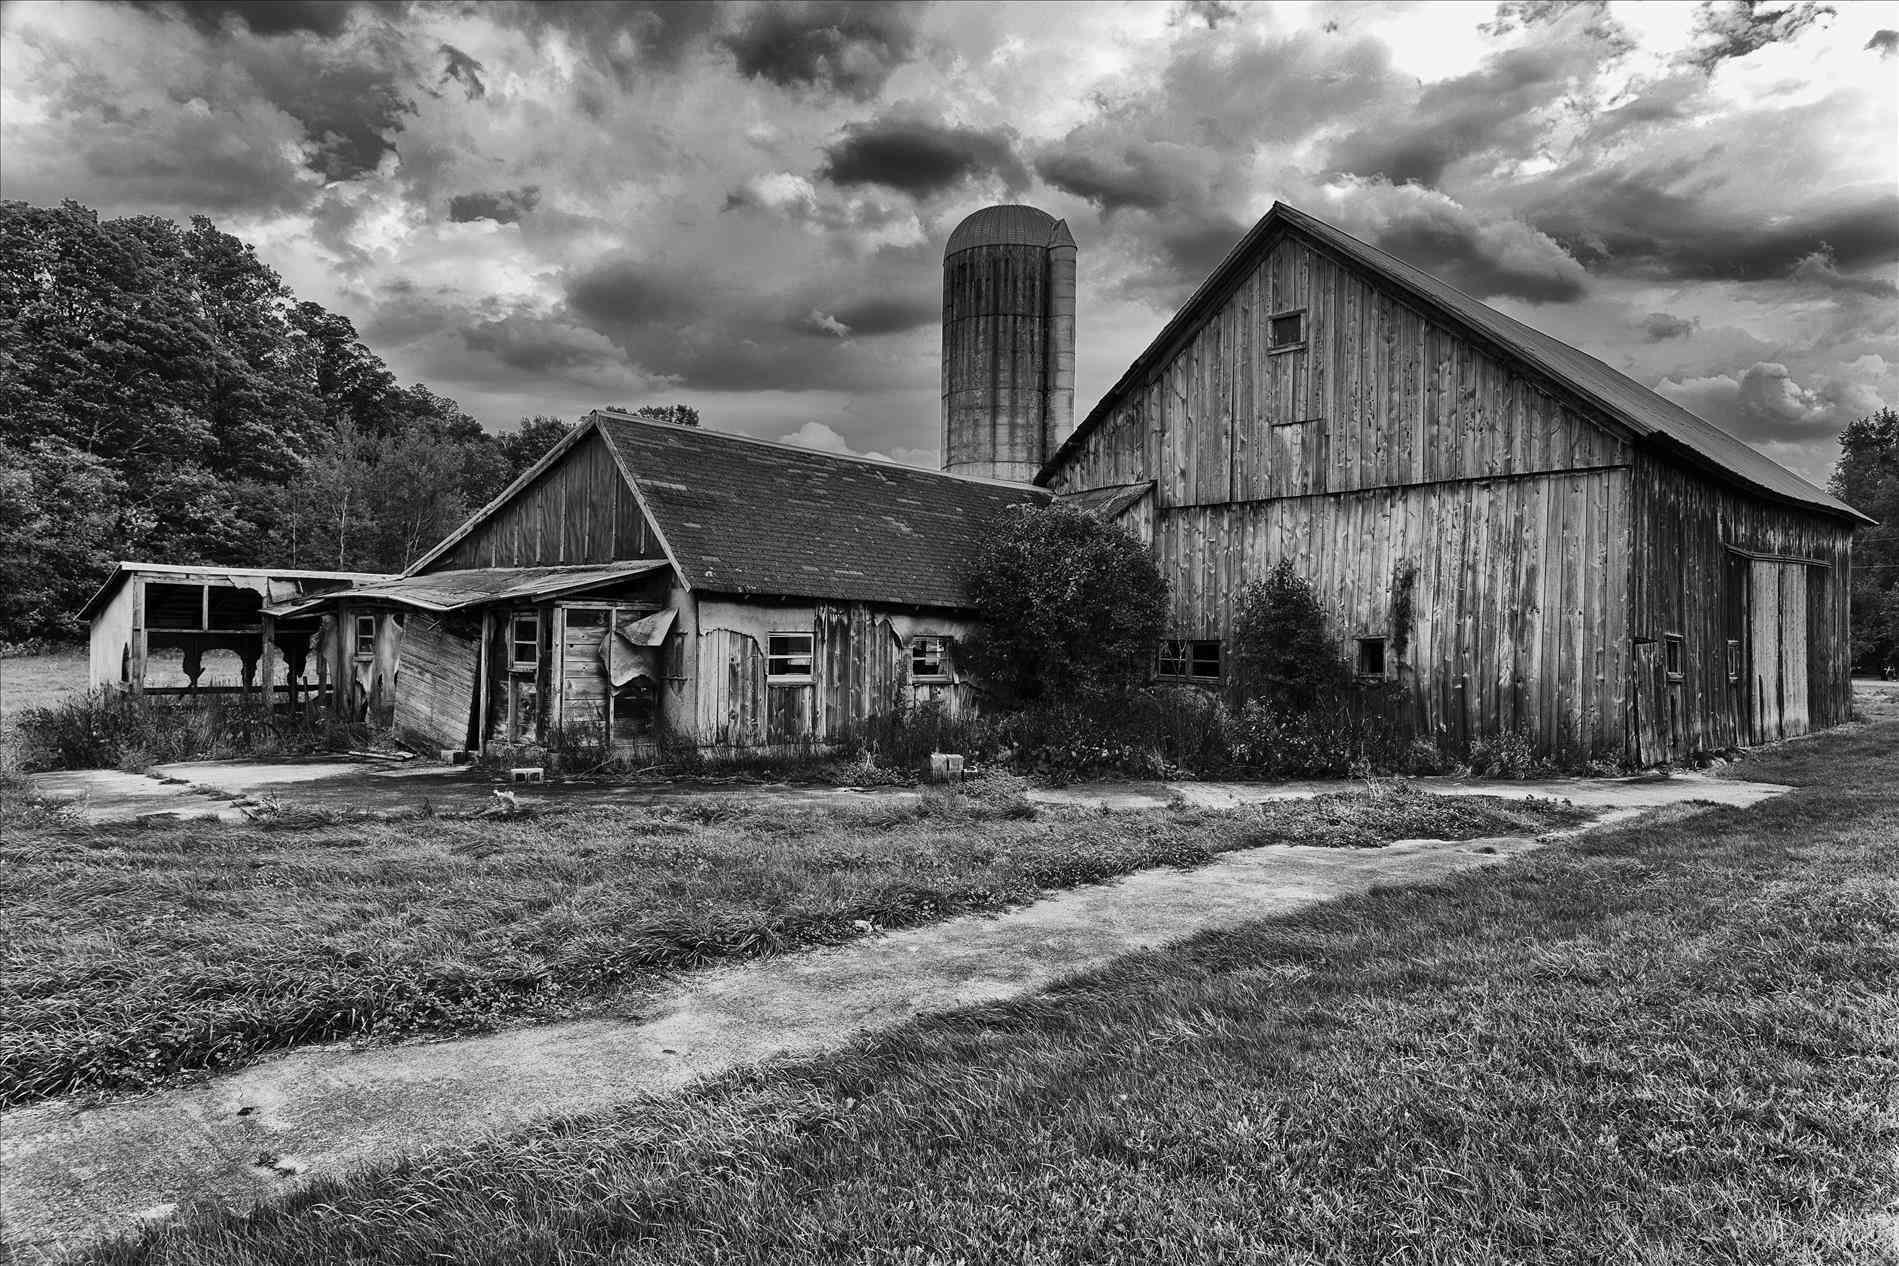 old farmhouse black and white dakota shack tau zerorhtauwordpresscom how to draw an barn farm house part youtuberhyoutubecom how old farmhouse black and white to draw